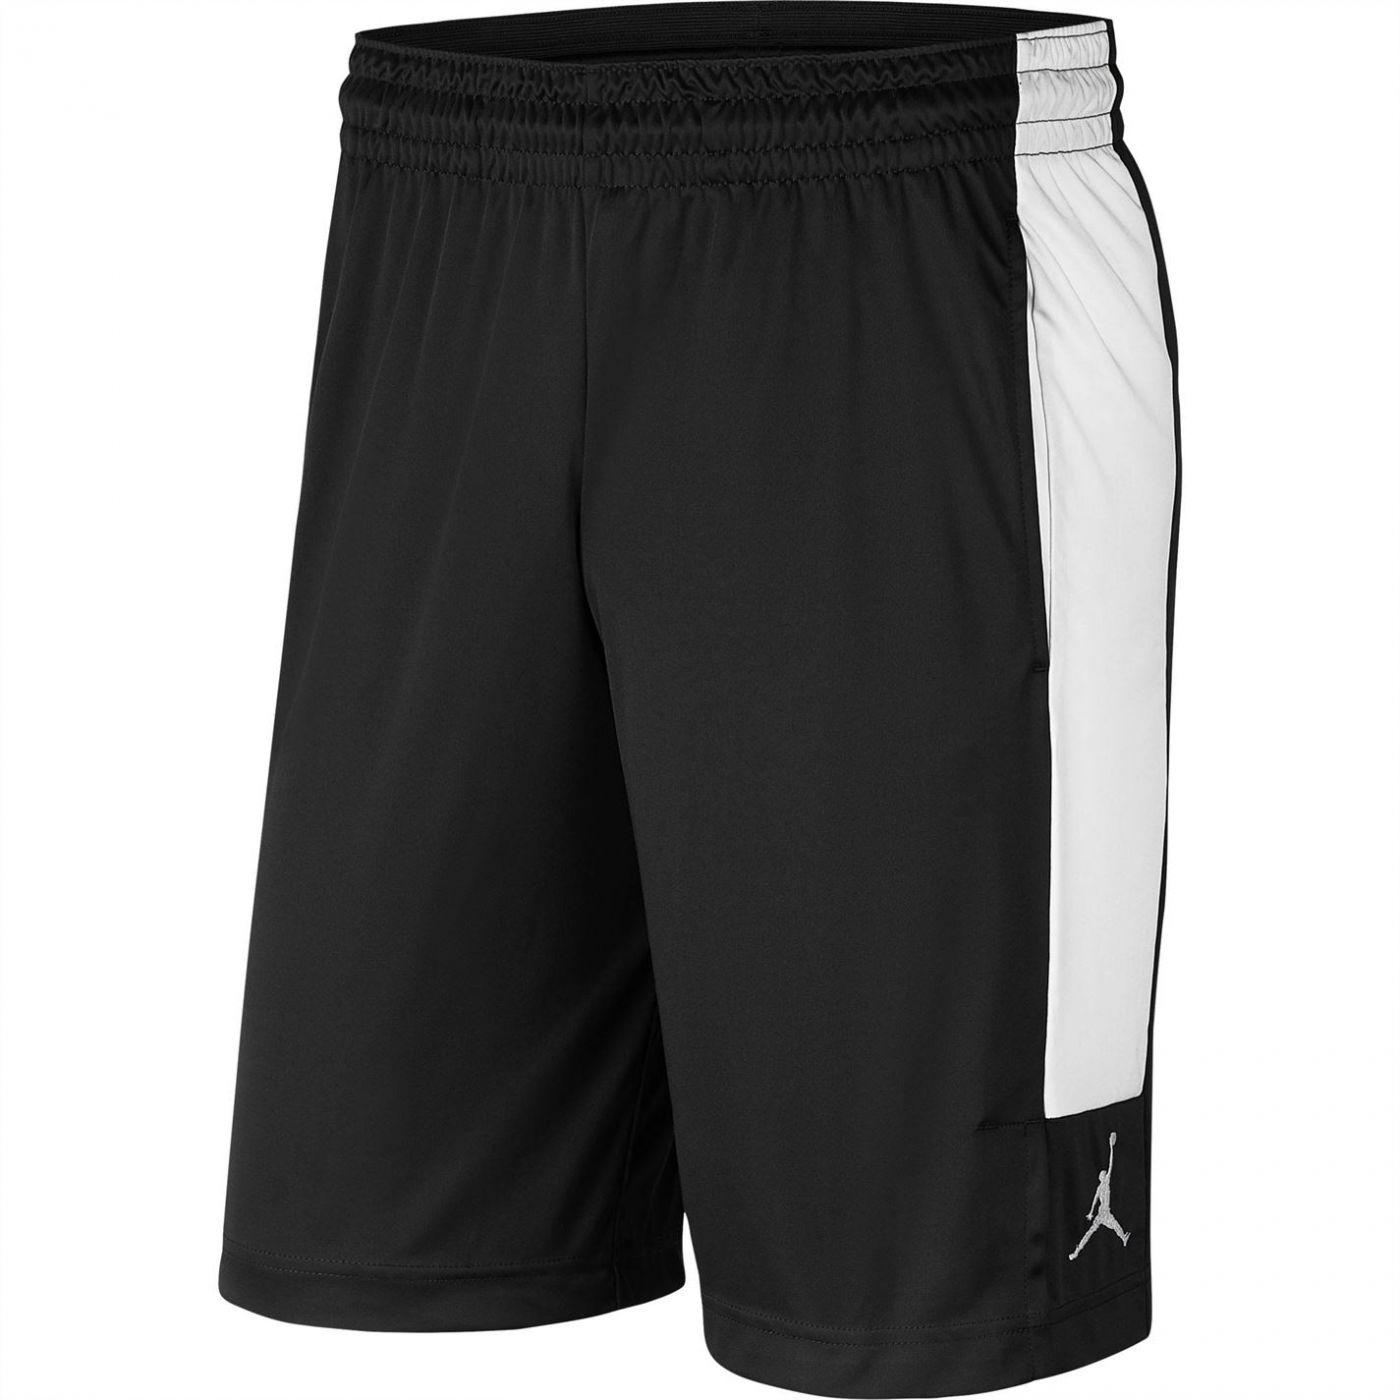 Air Jordan Dri-FIT 23 Alpha Shorts Mens